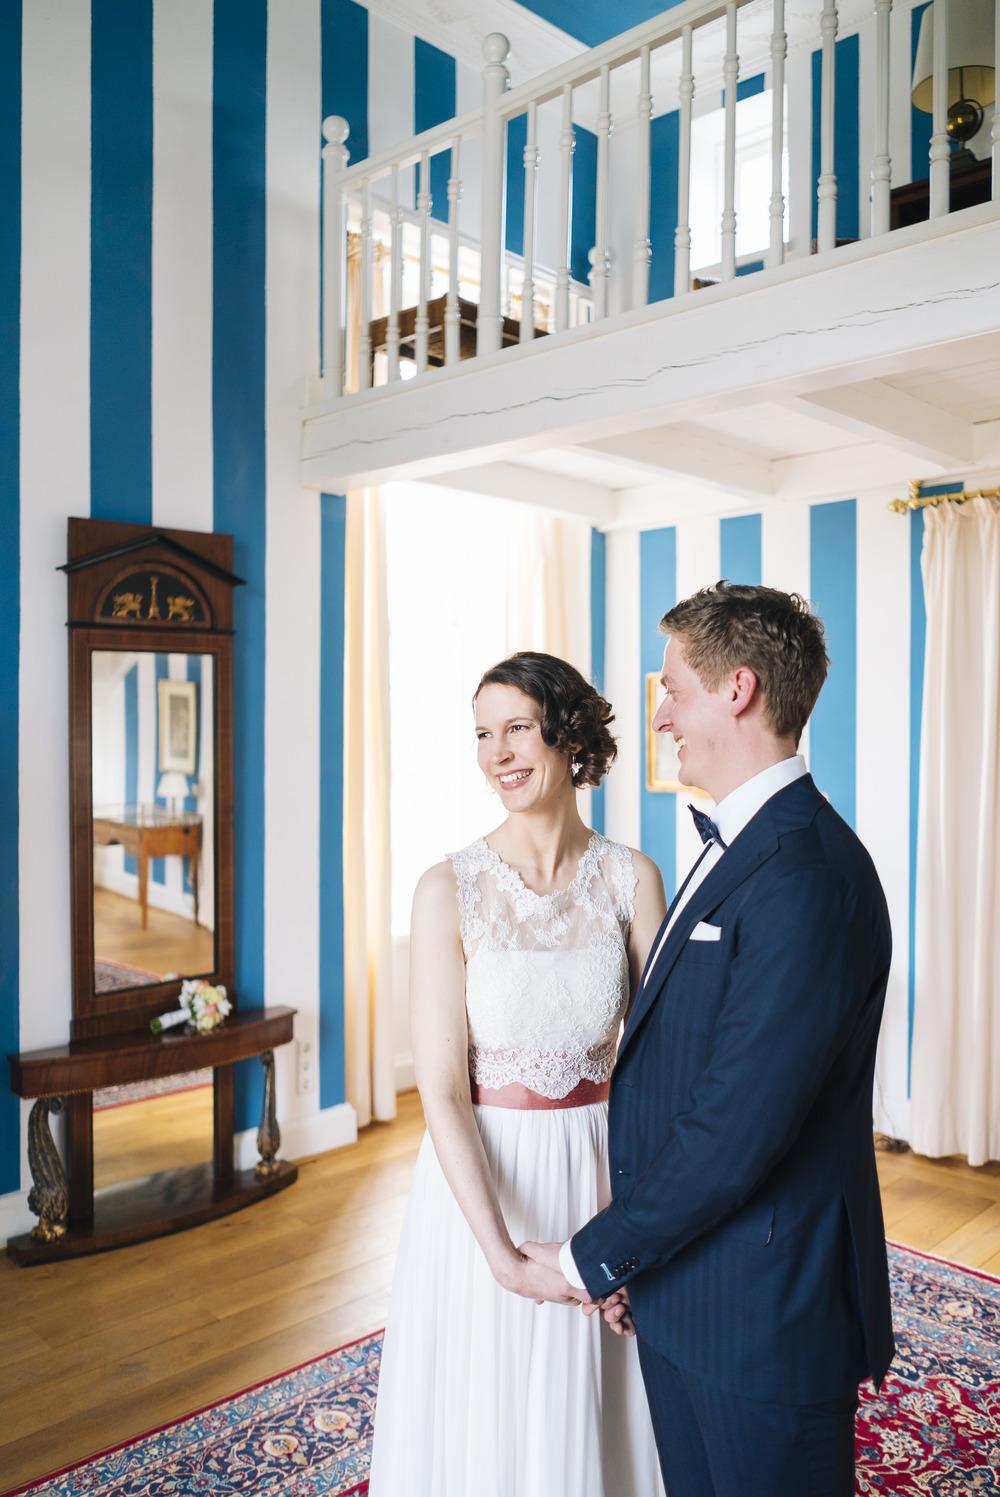 Hochzeitsfotograf-Schlossruine-Hertefeld-Weeze-019.jpg